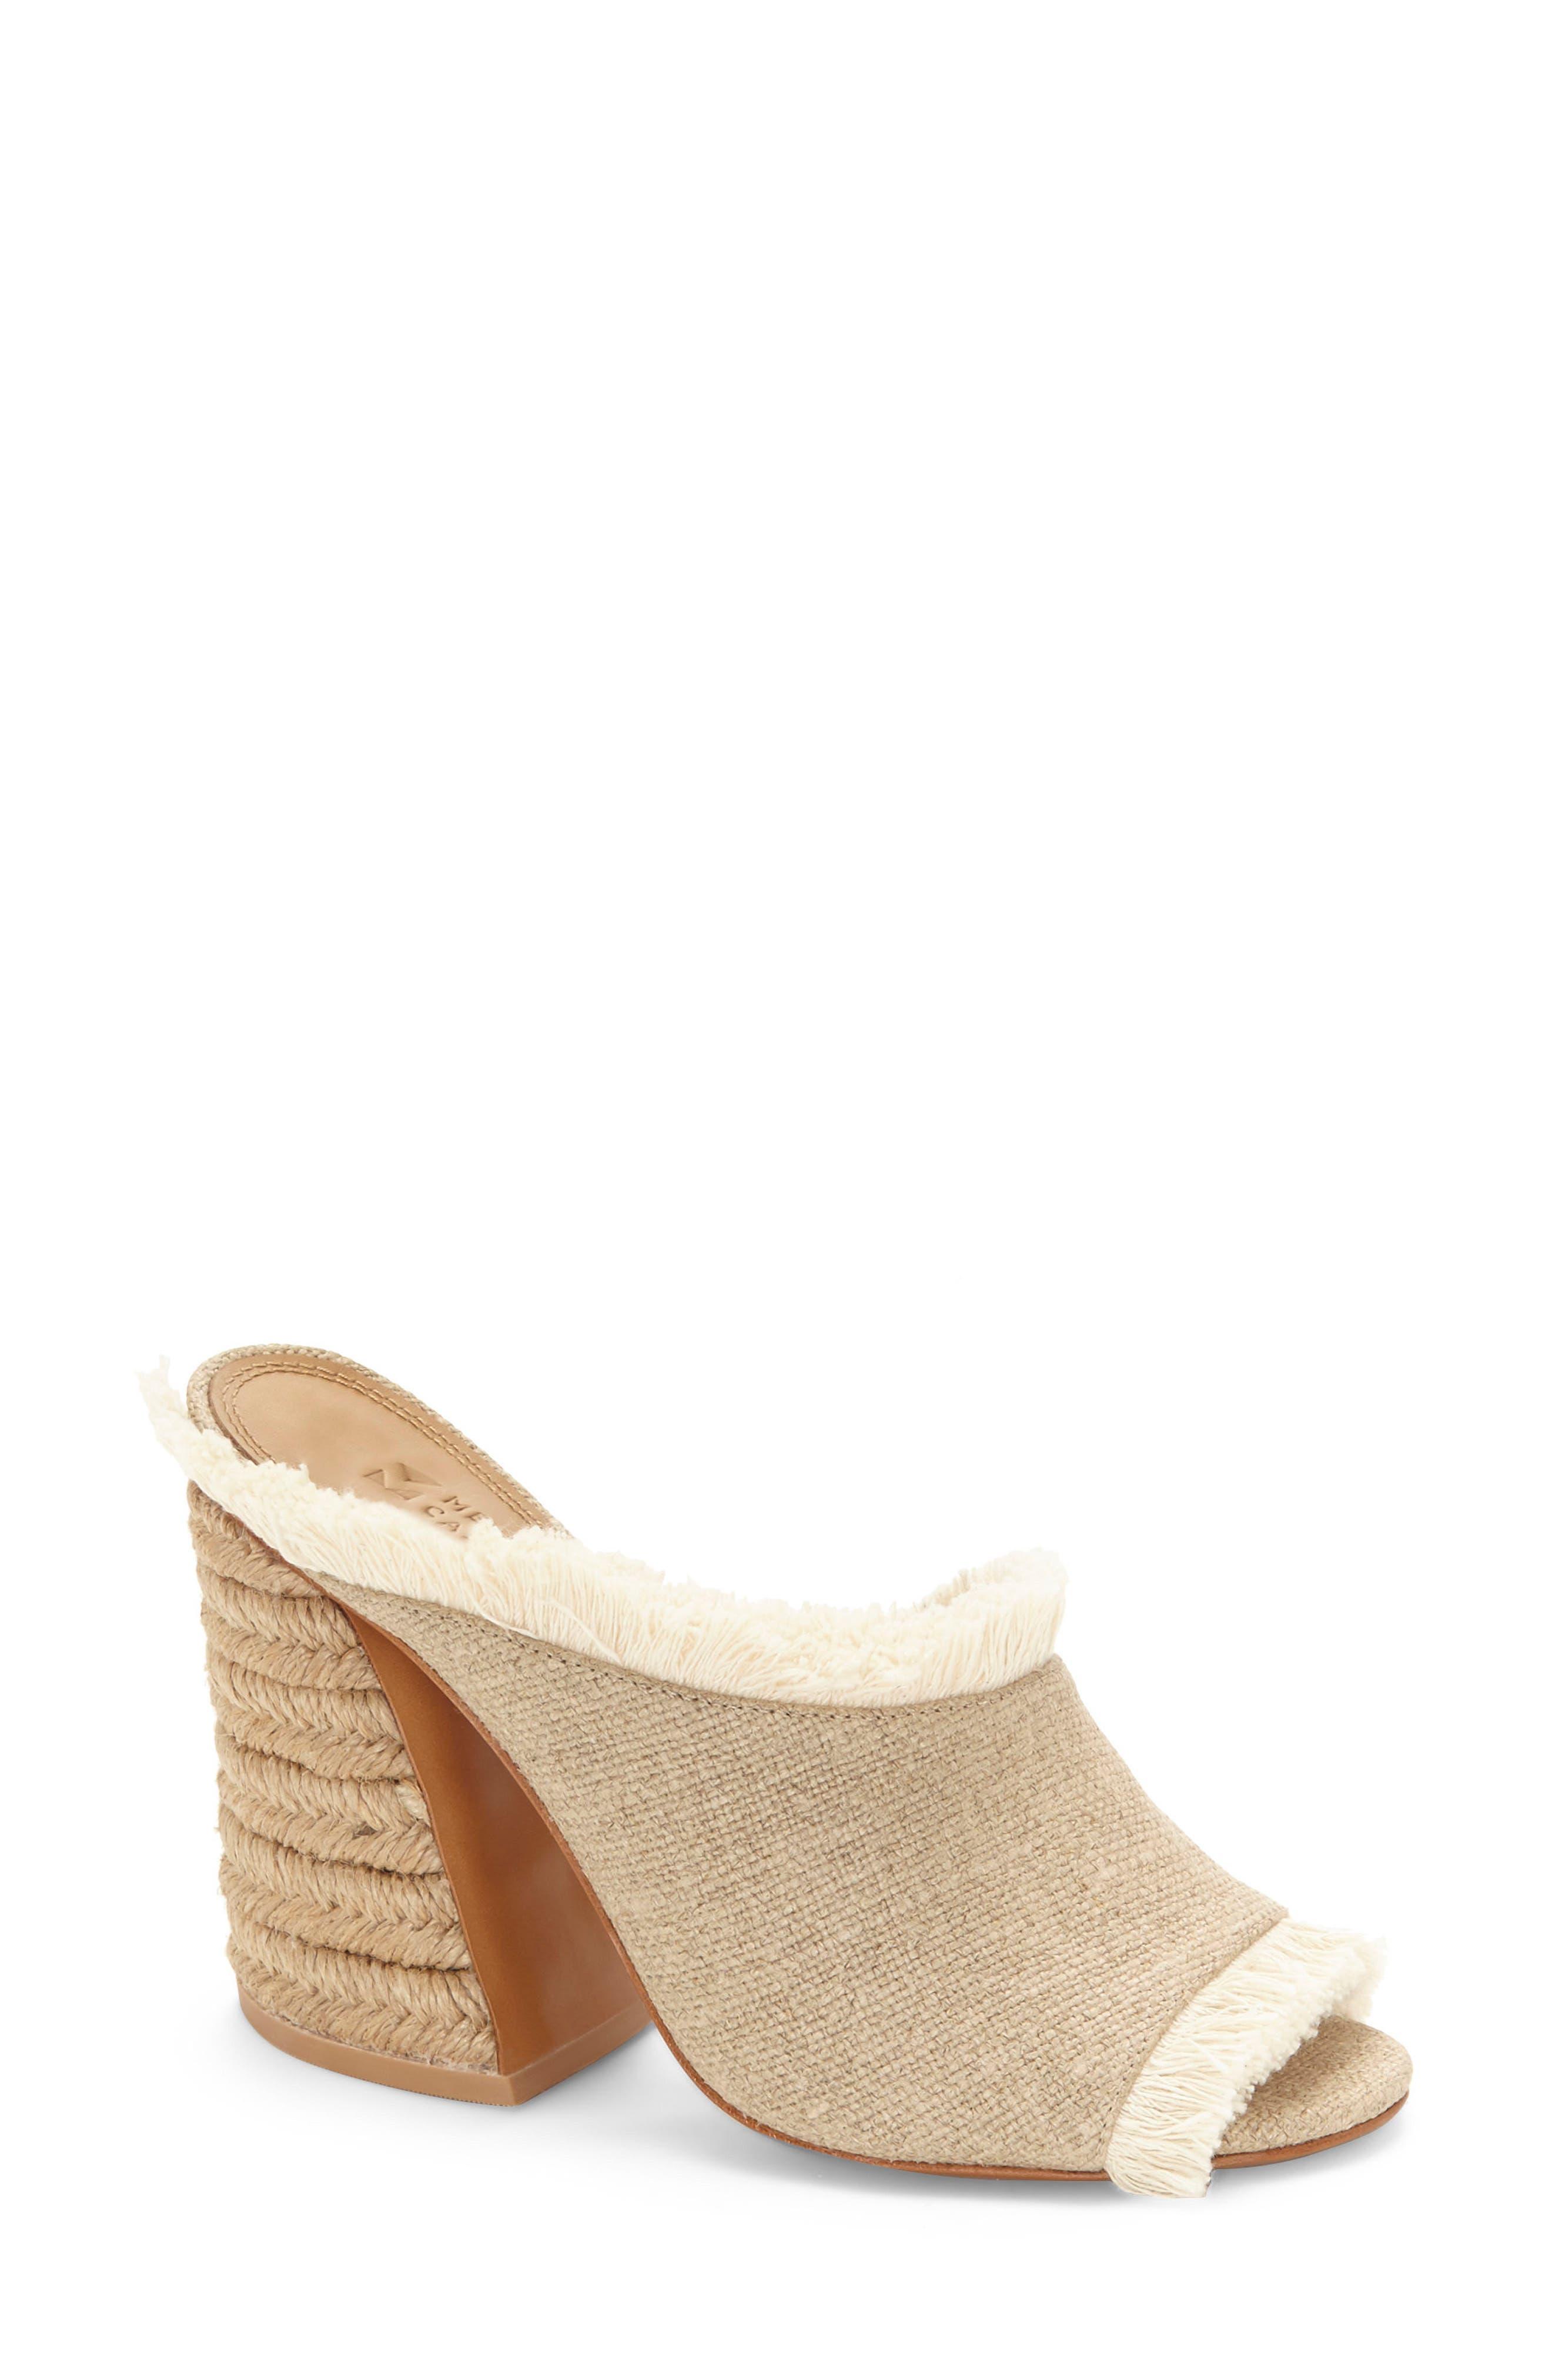 Izar Fringe Asymmetrical Sandal,                             Main thumbnail 1, color,                             250